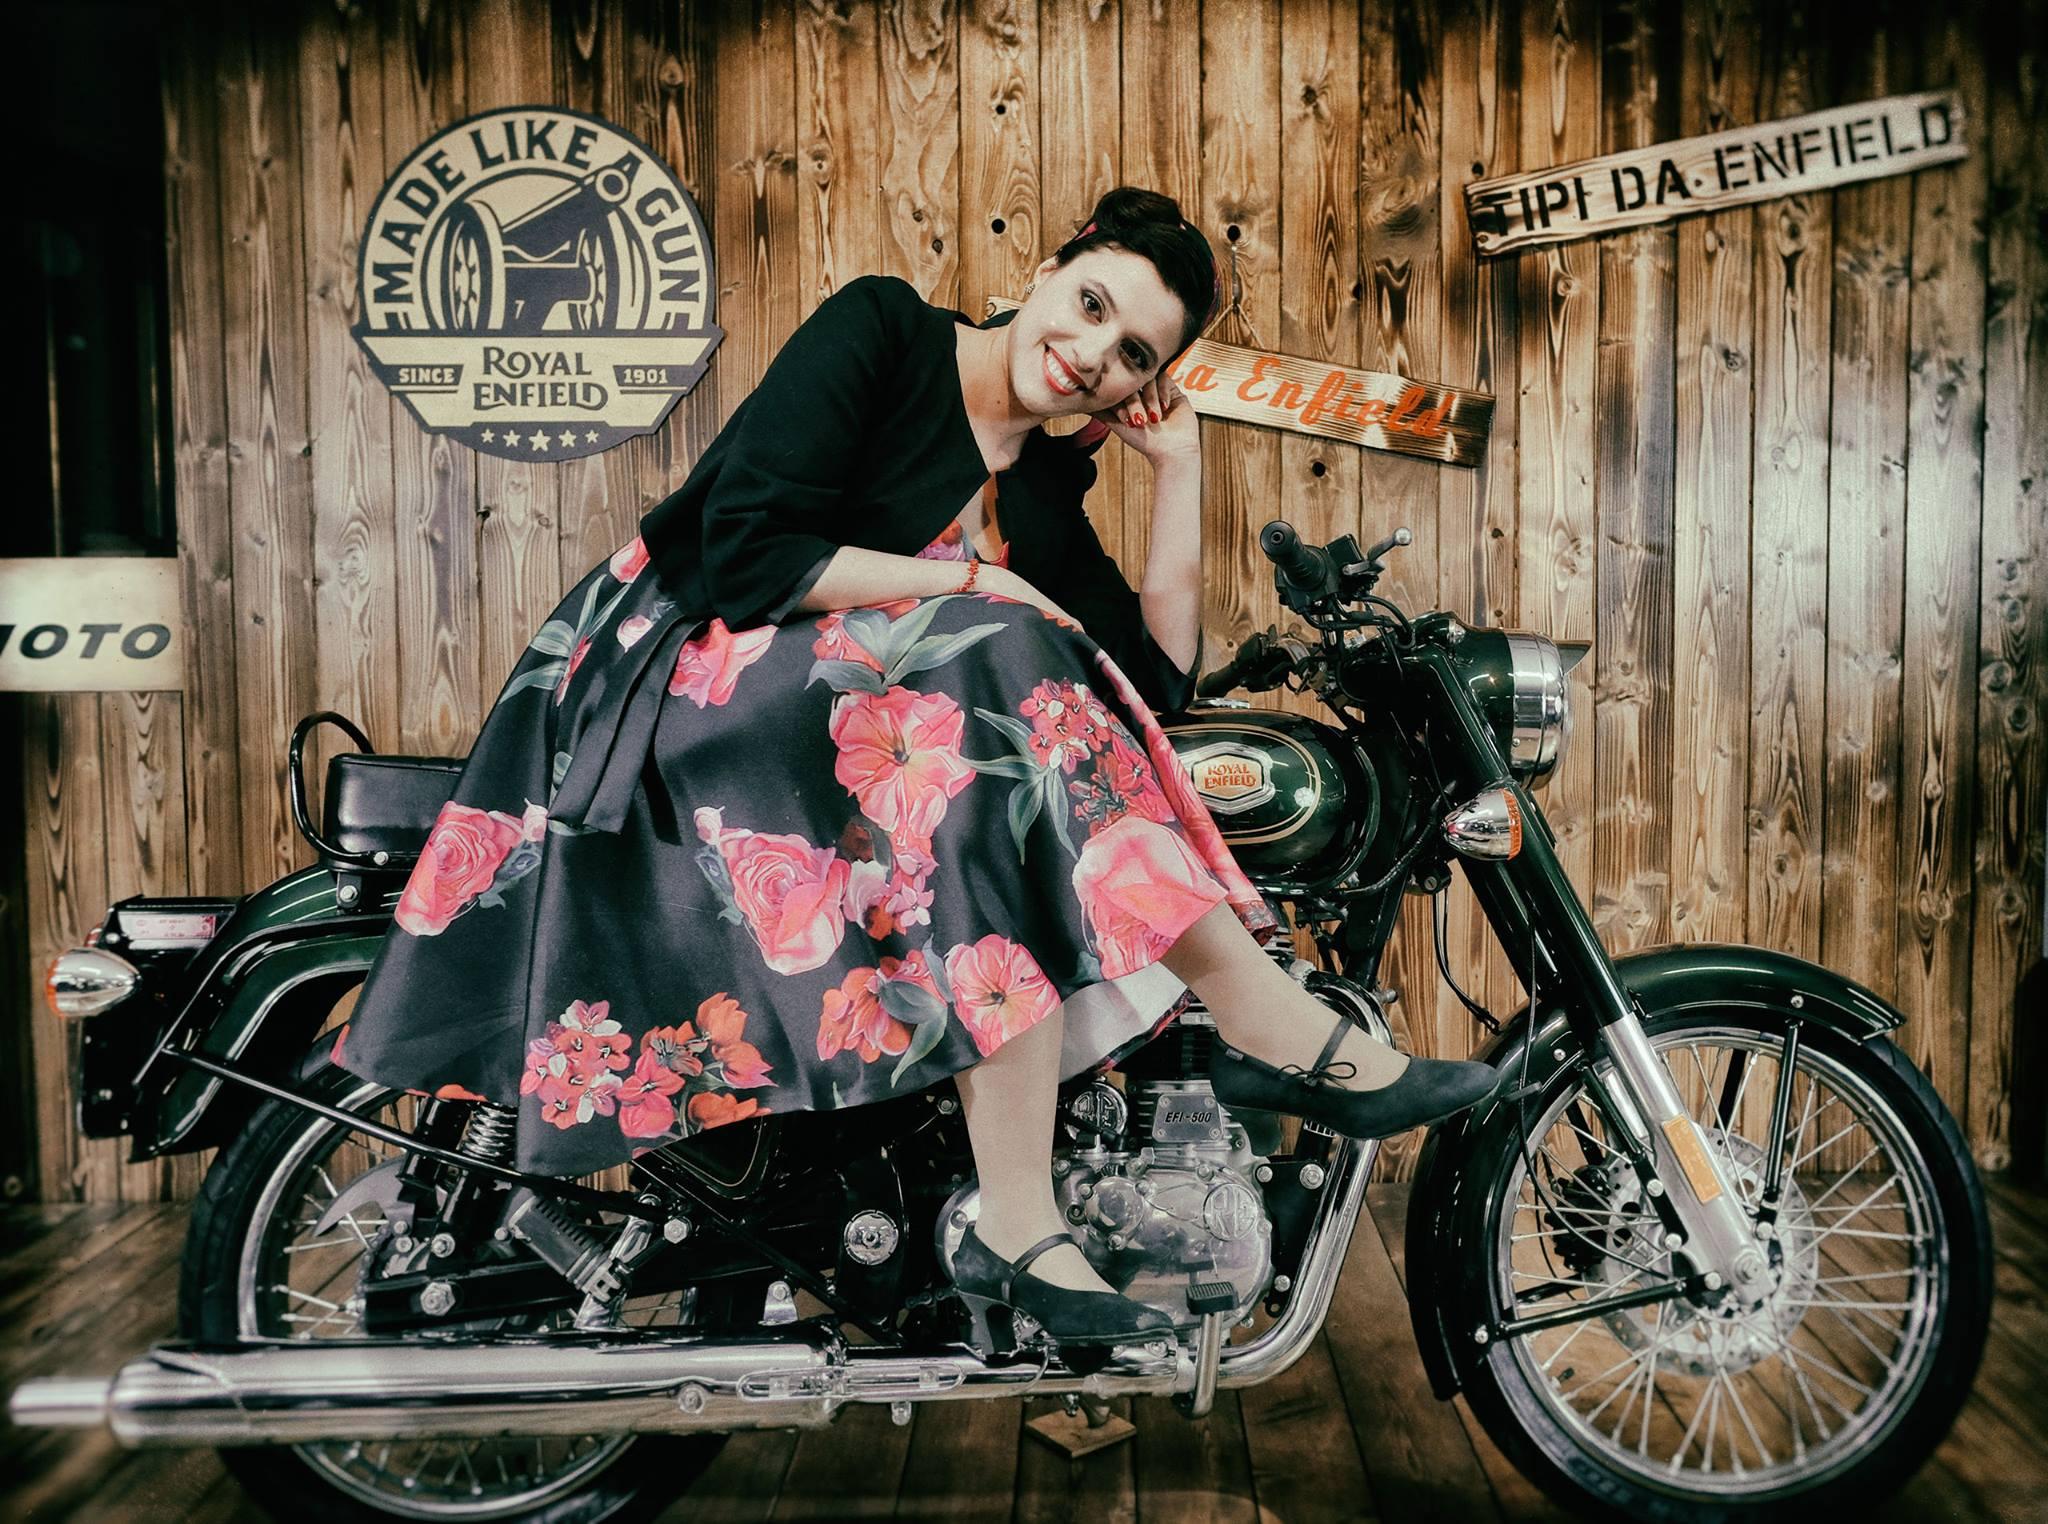 royal-enfield-piacenza-moruzzi-moto-wonderland-campagna-promo-20